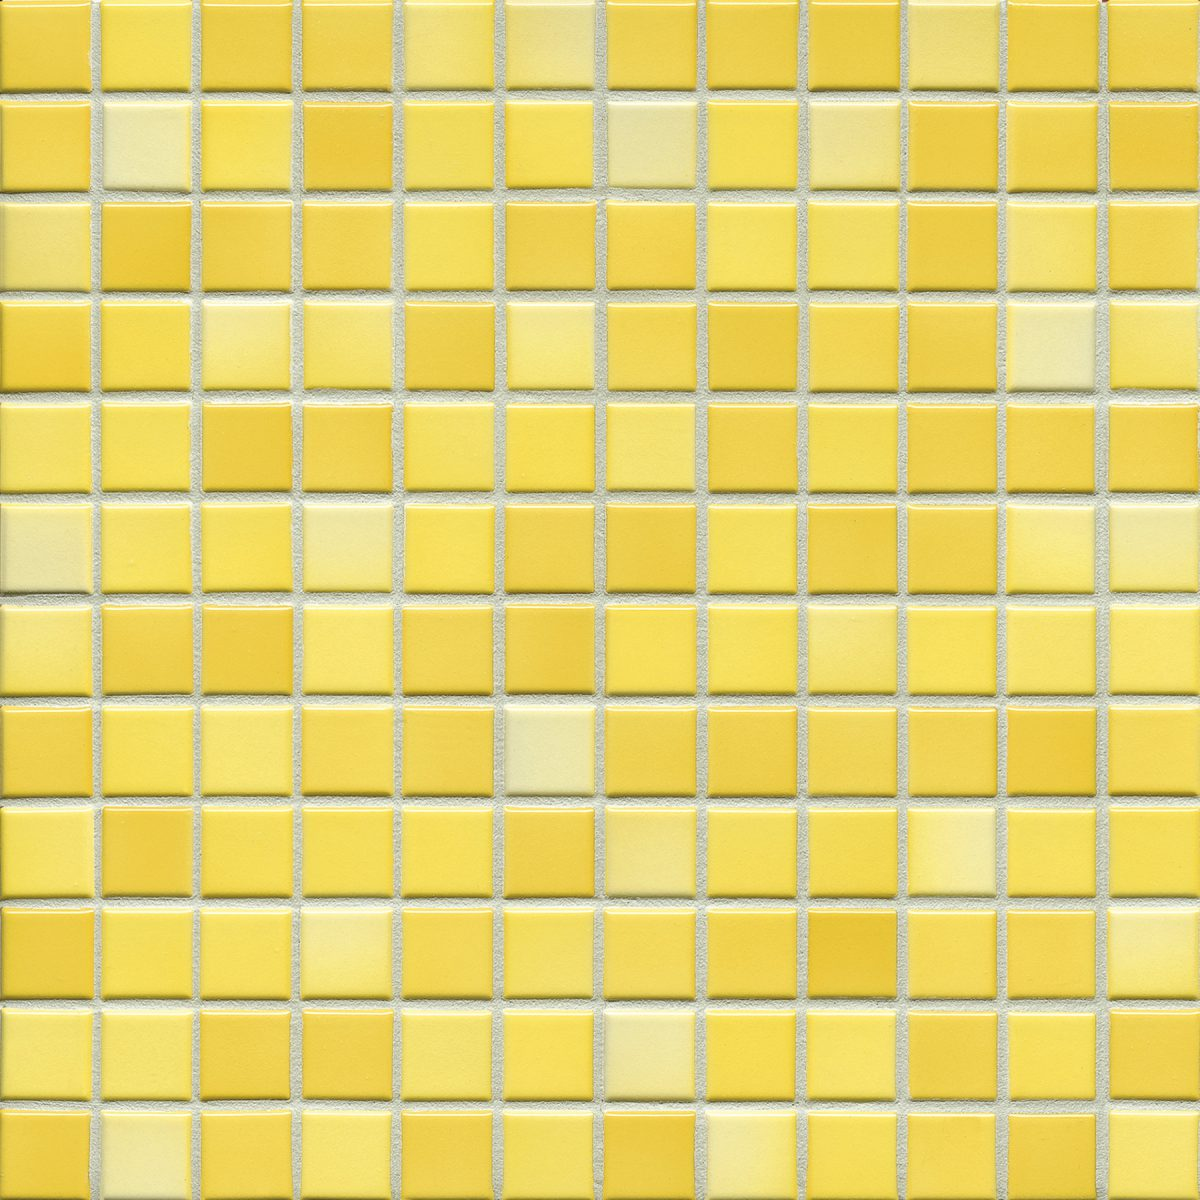 Мозаика серия Fresh 2,4 X 2,4 см Sunshine Yellow Mix Glossy (глазурованная)